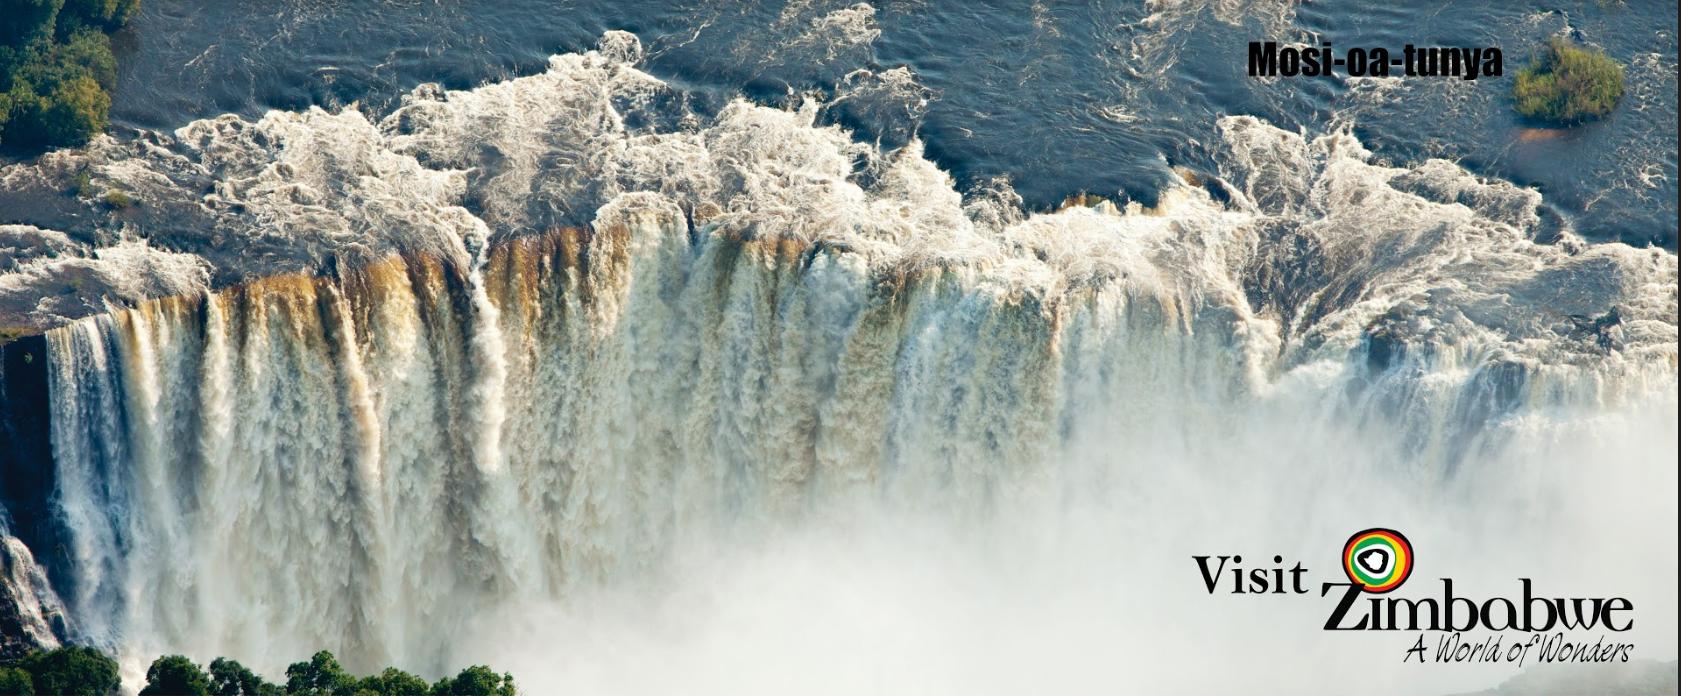 Welcome to Zimbabwe - A World of Wonders